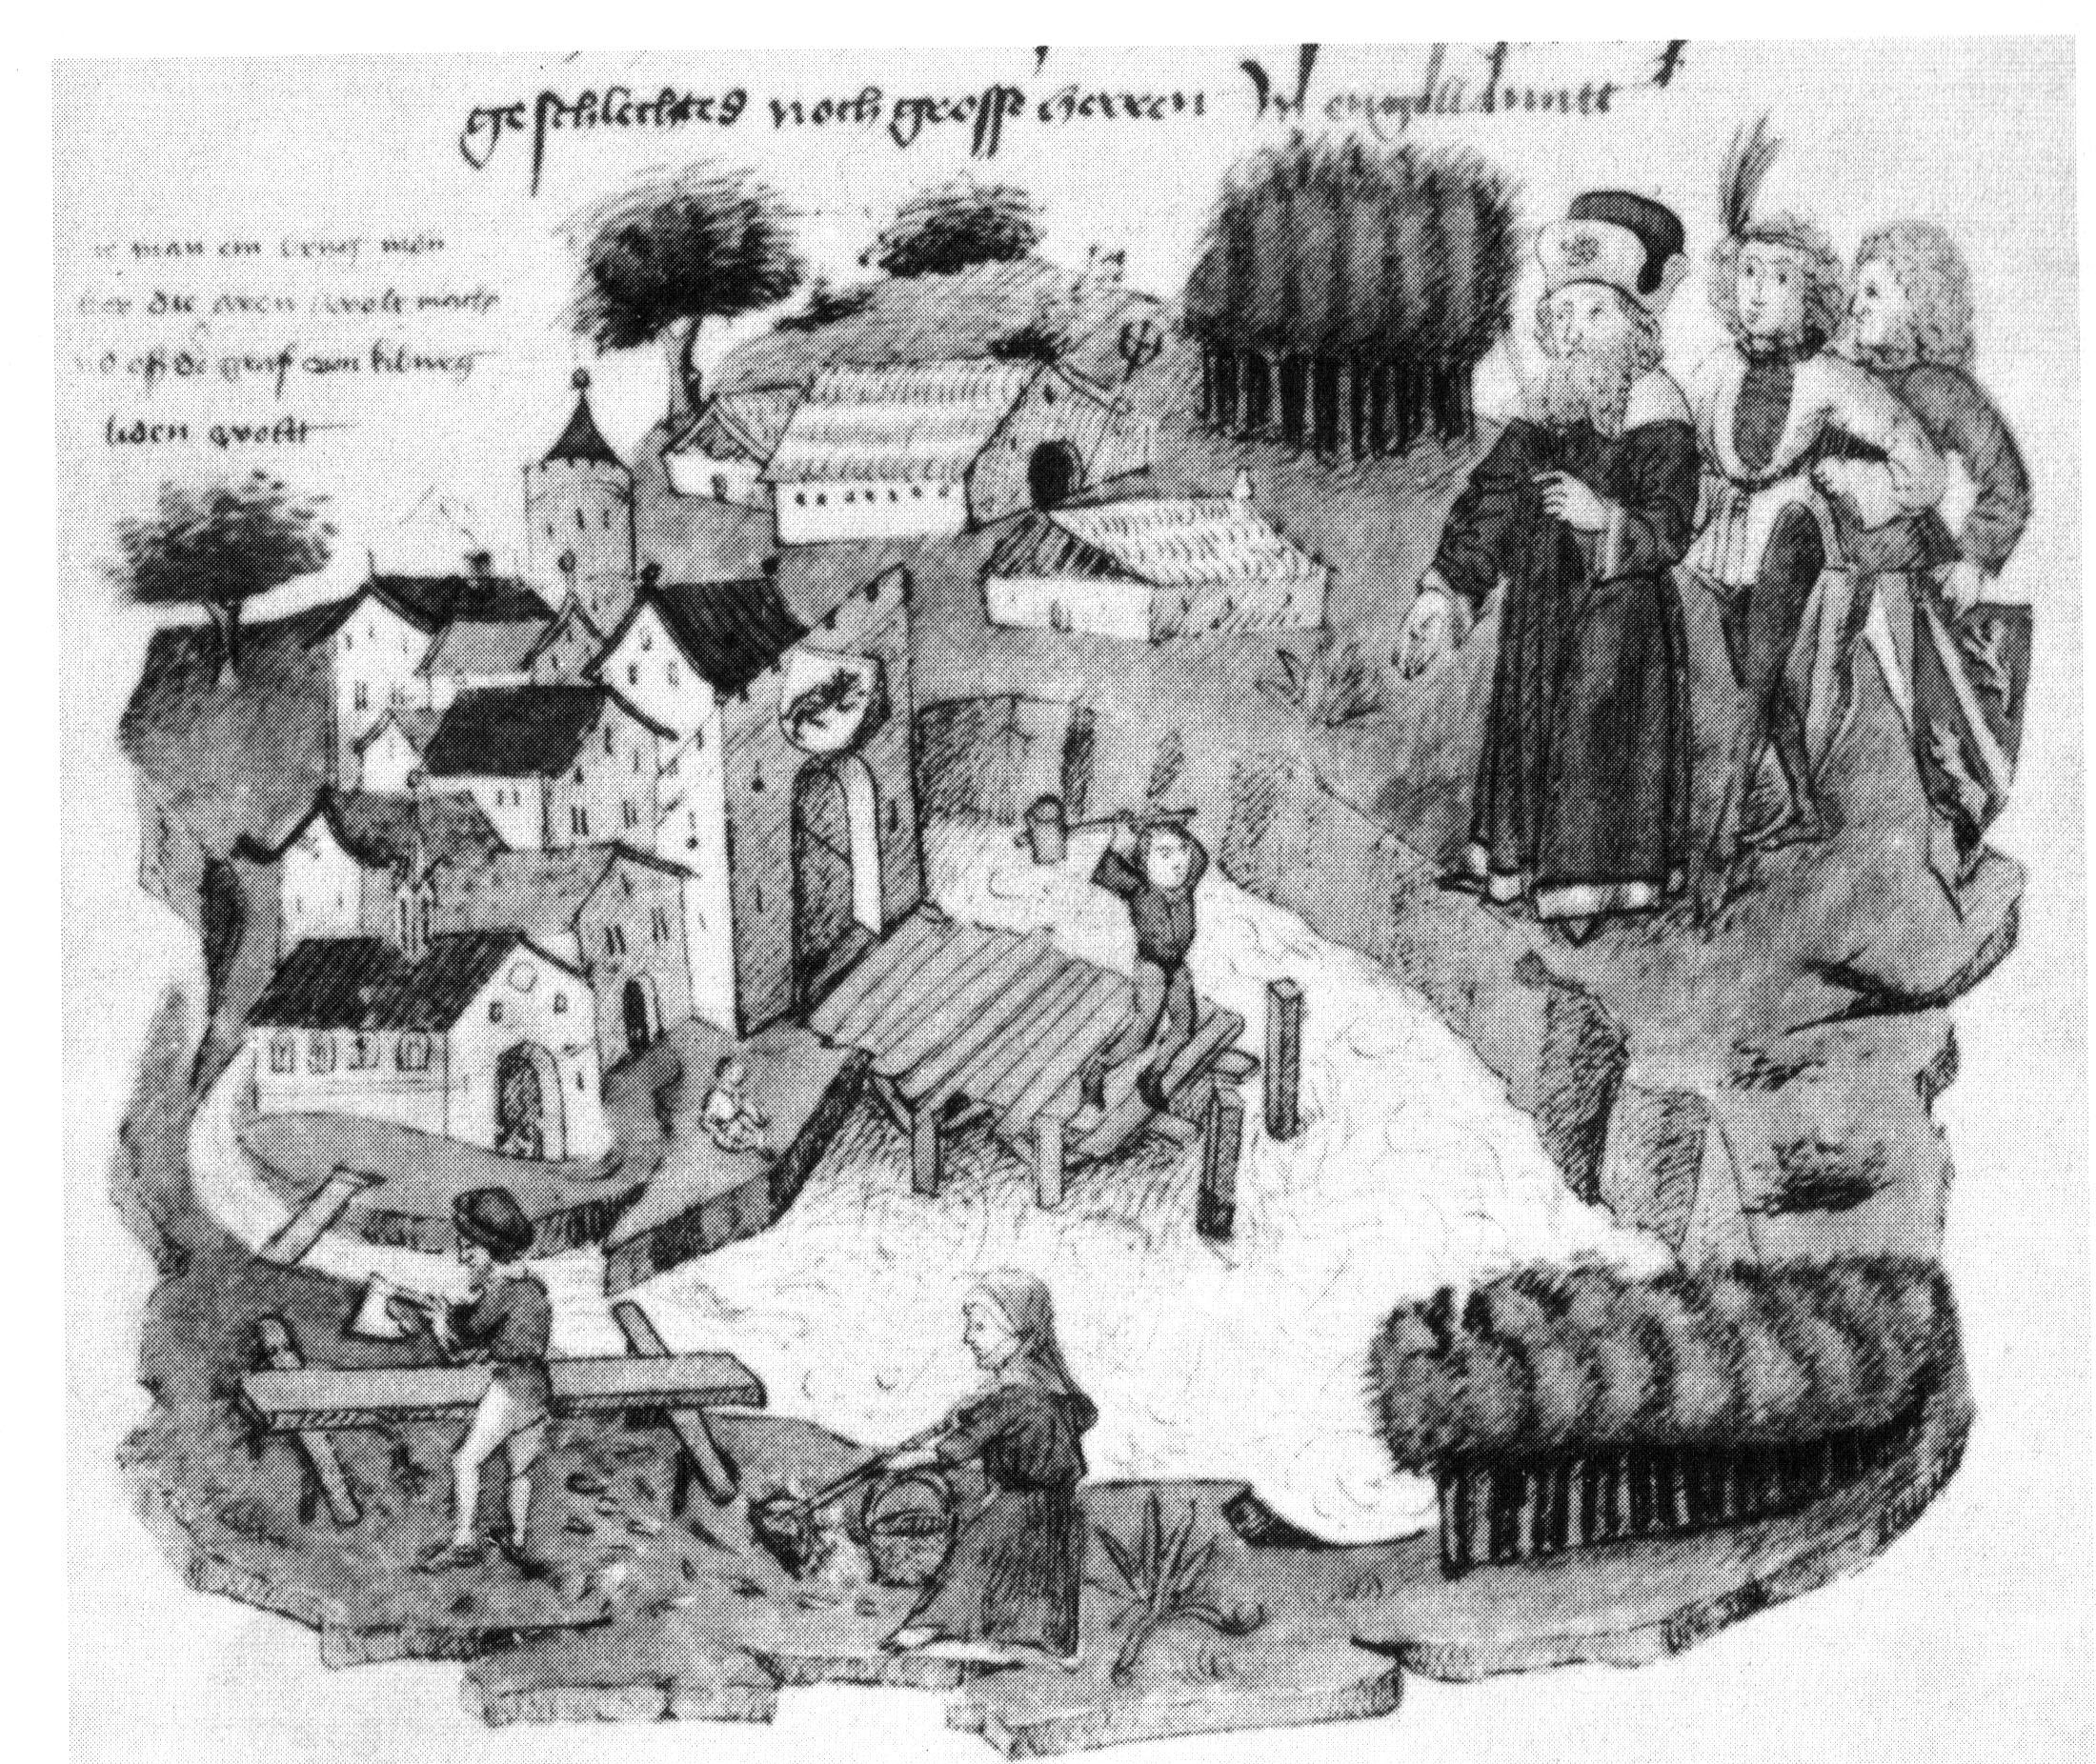 The construction of the Untertor-bridge in Bern, Tschachtlanchronik, late 15th century